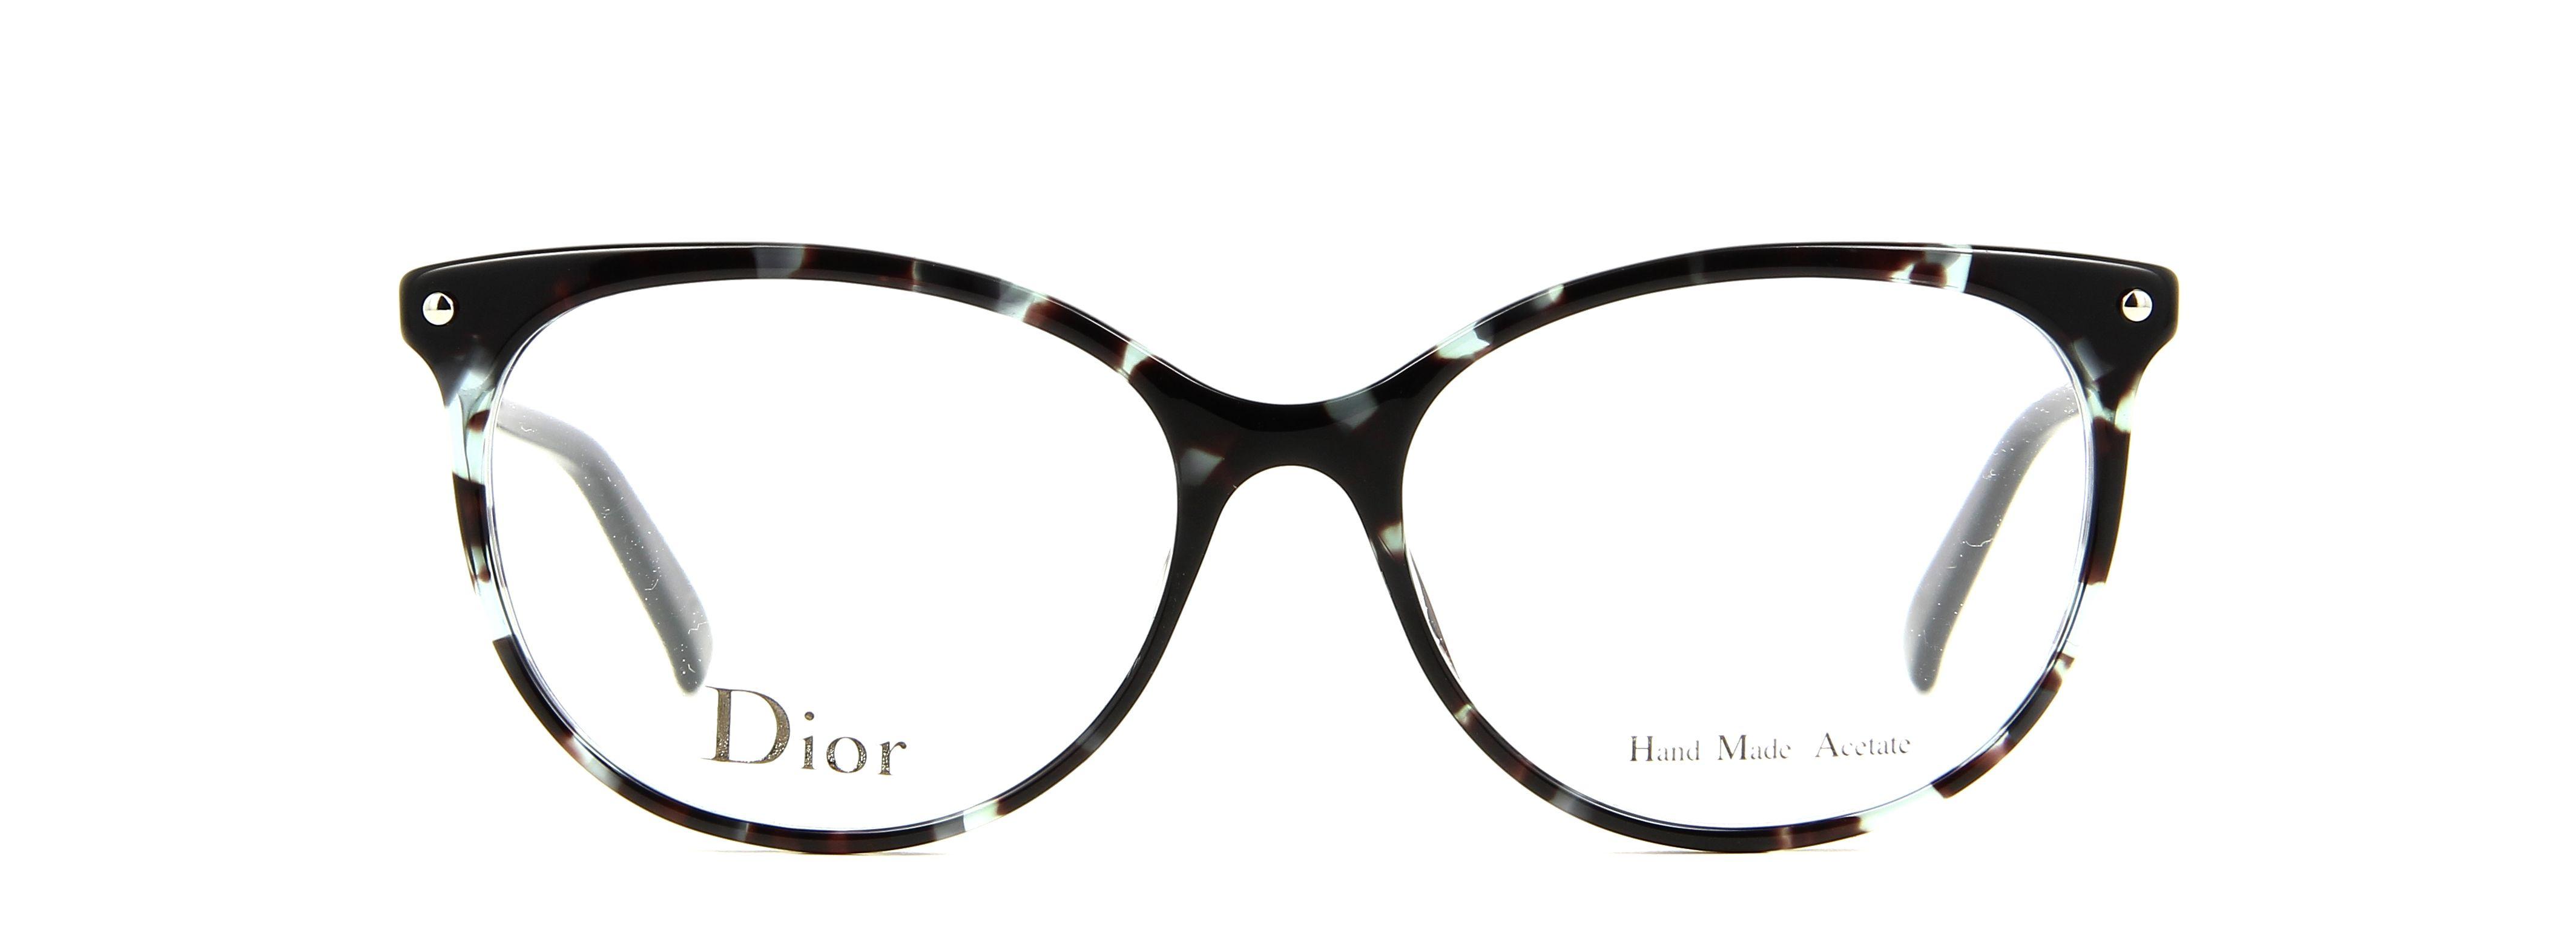 lunettes de vue dior cd 3284 lbt 53 16 femme ecaille vert bleu papillon cercl e tendance. Black Bedroom Furniture Sets. Home Design Ideas